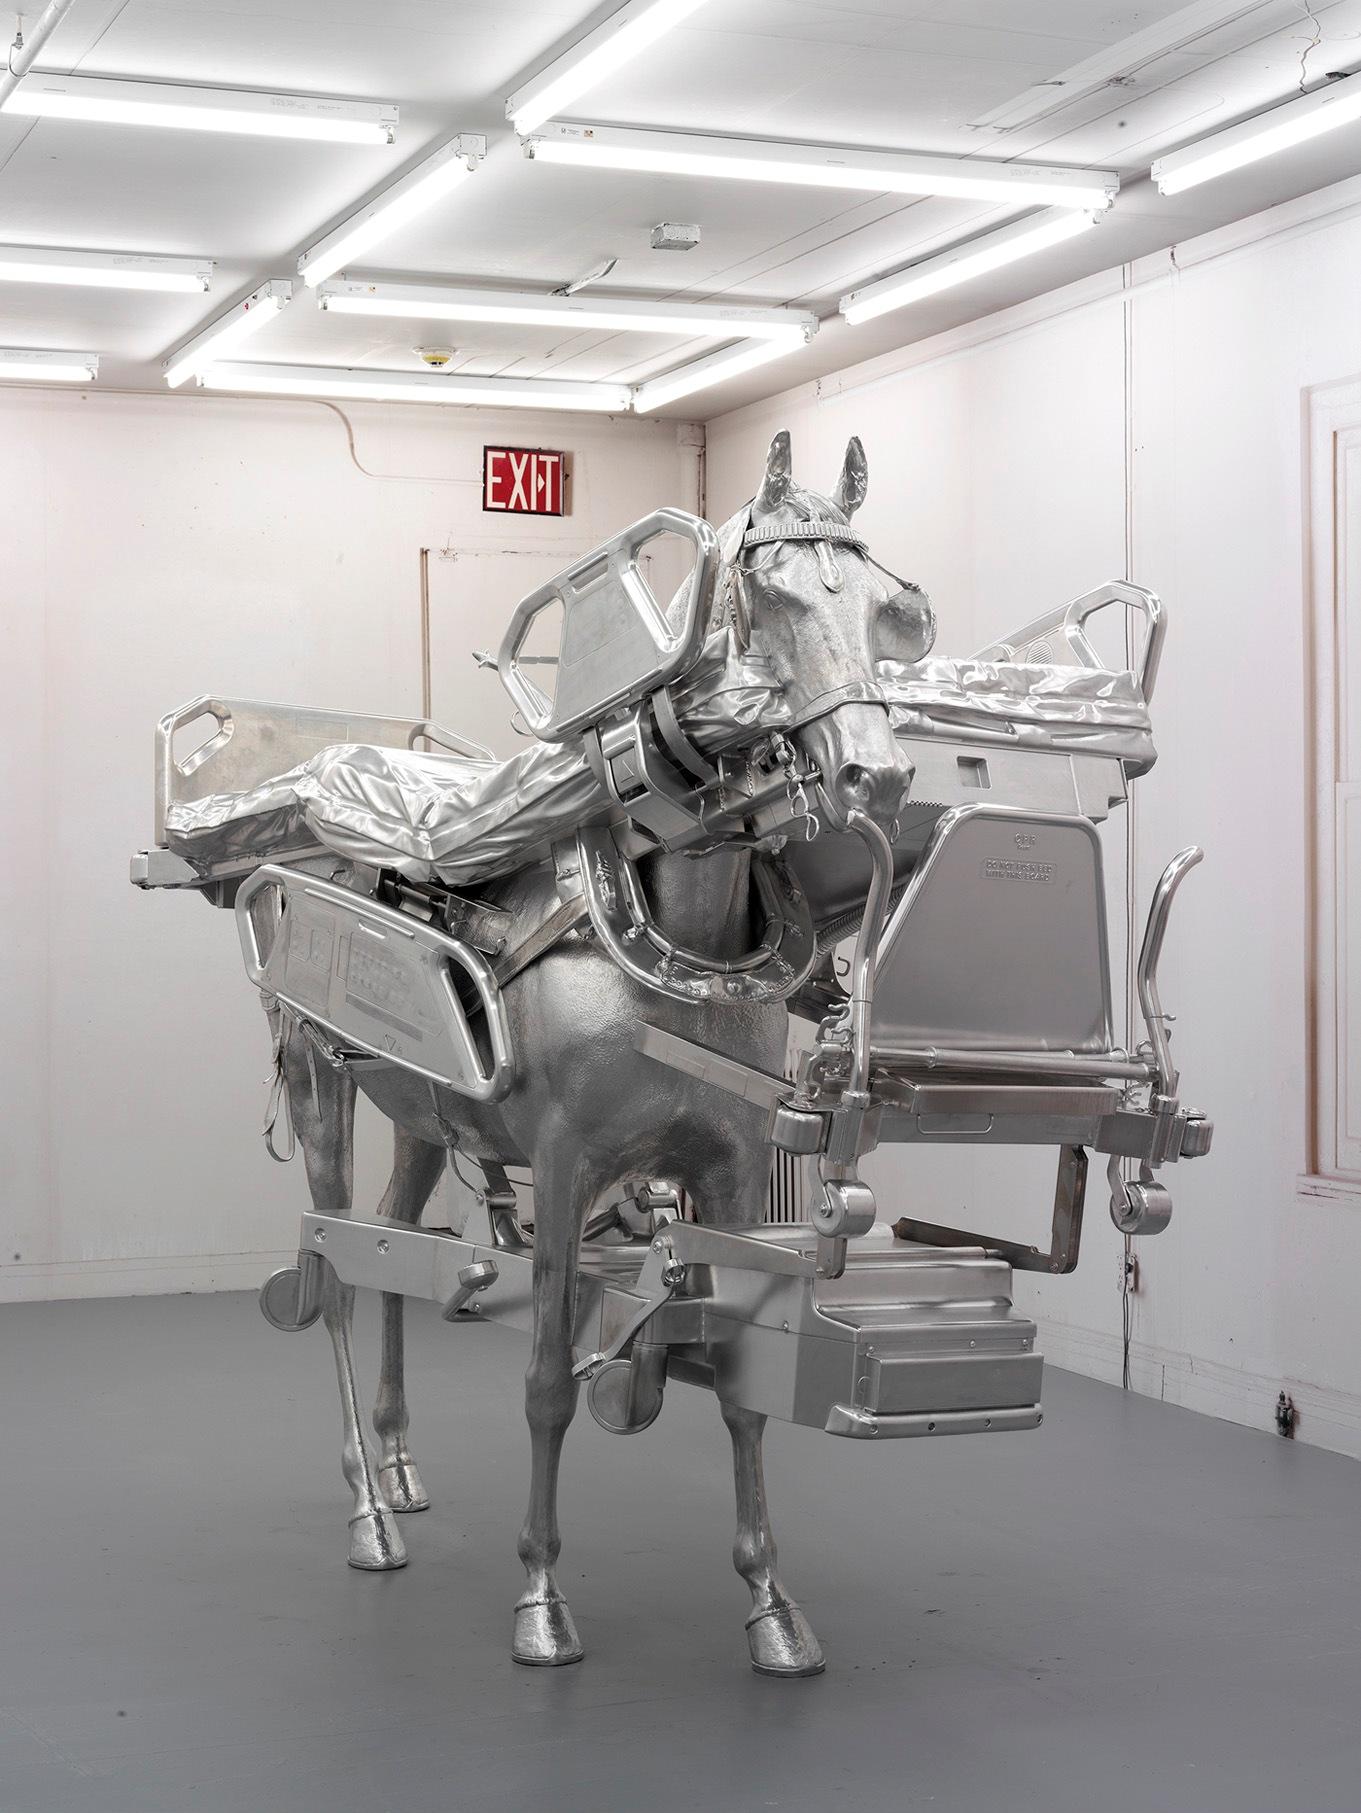 Urs Fischer, Horse/Bed, 2013, alluminio lucido fresato, acciaio zincato, viti, perni, due elementi in resina, 85 7/8 x 103 5/8 x 43 3/4 inches (218.2 x 263.1 x 111.1 cm) Edizione di 3 & 1 AP © Urs Fischer. Courtesy Urs Fischer e Gagosian Gallery. Foto: Stefan Altenburger